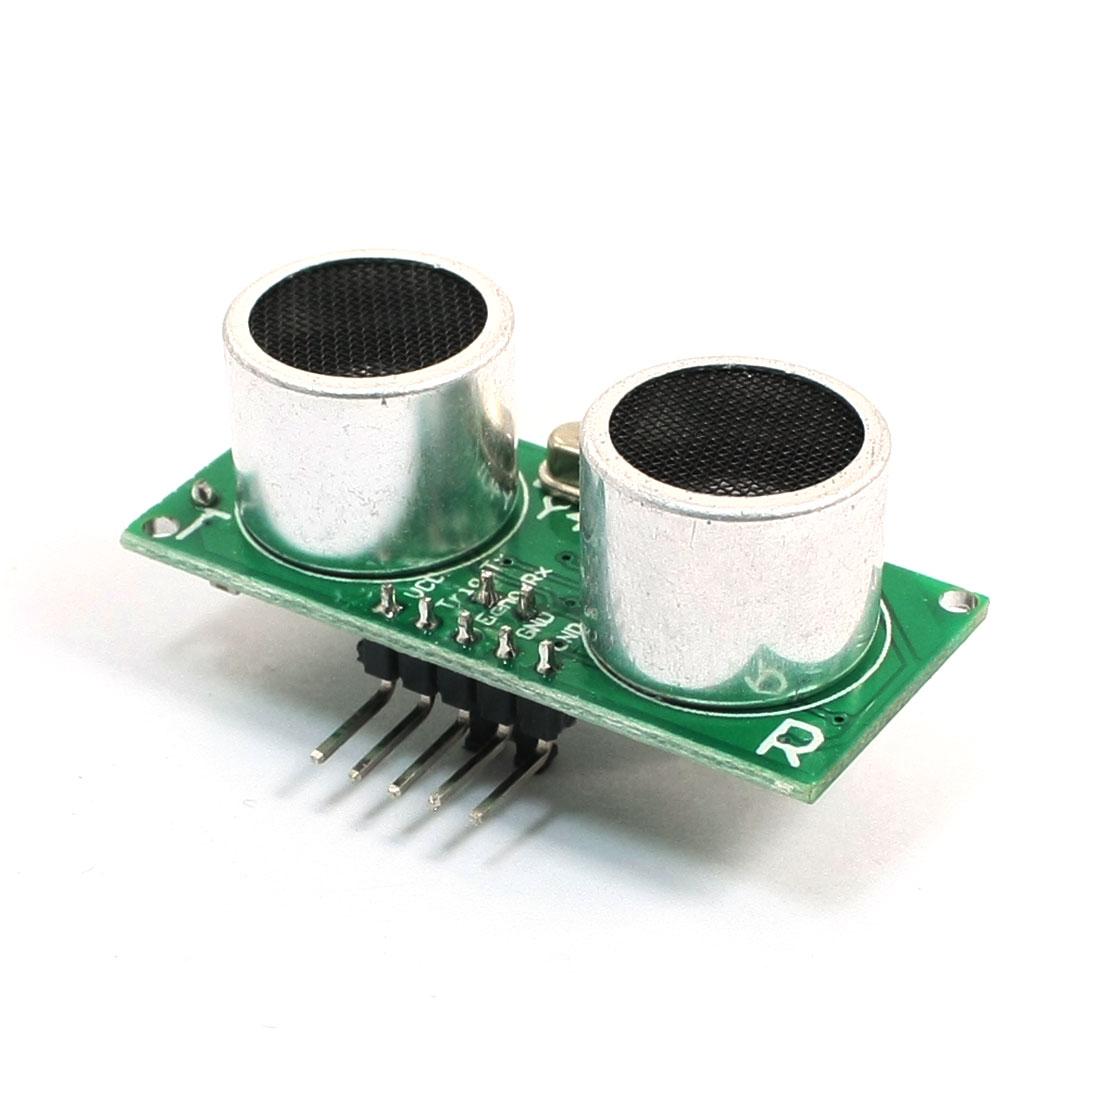 DC5V 2mA SCM Ultrasonic Module US-100 Distance Measuring Transducer Sensor